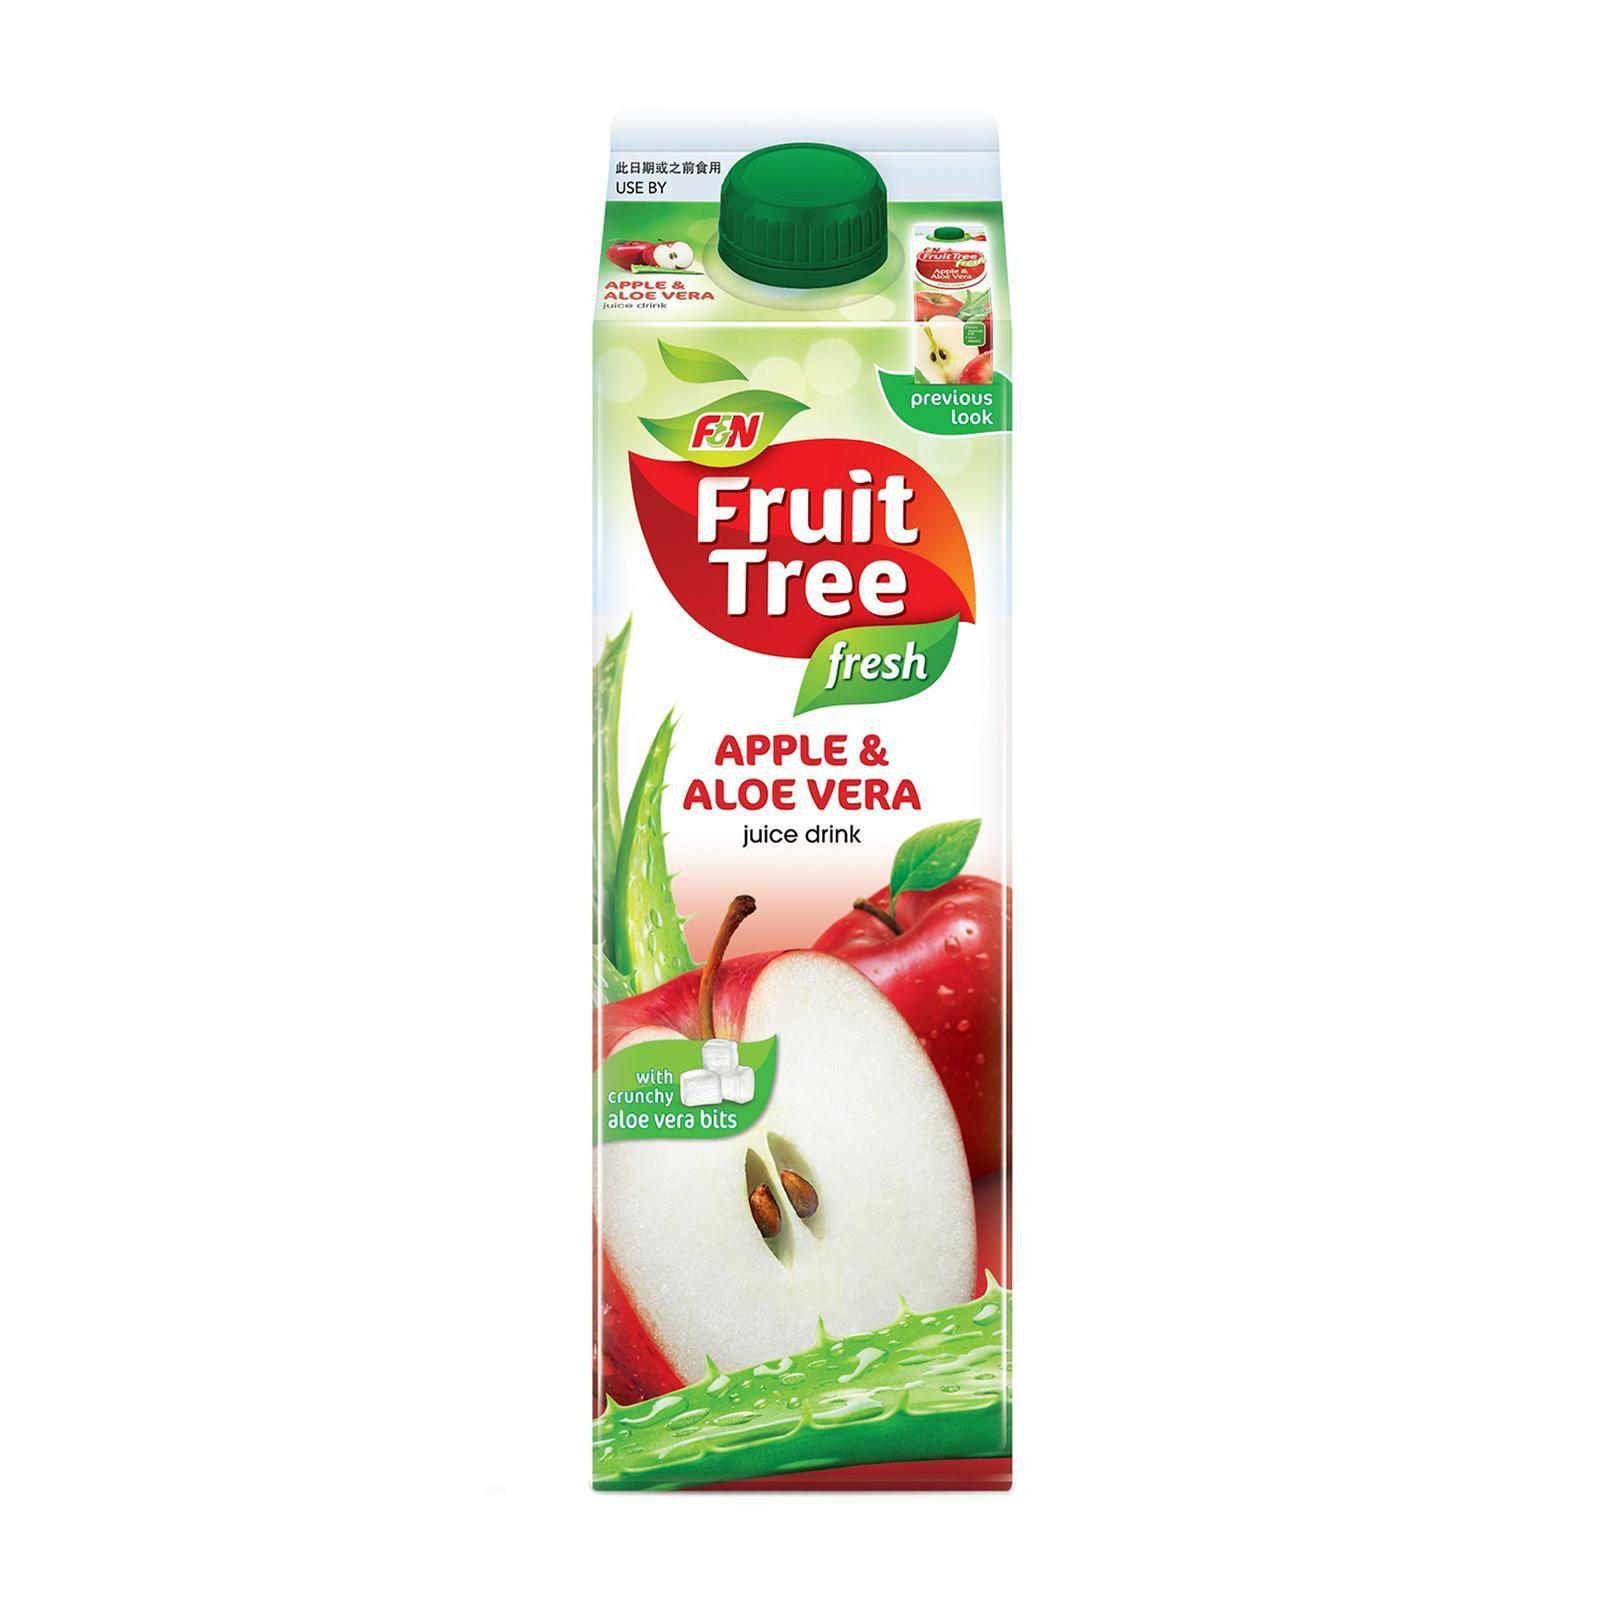 Fruit Tree Fresh Apple Juice With Aloe Vera Bits Less Sugar